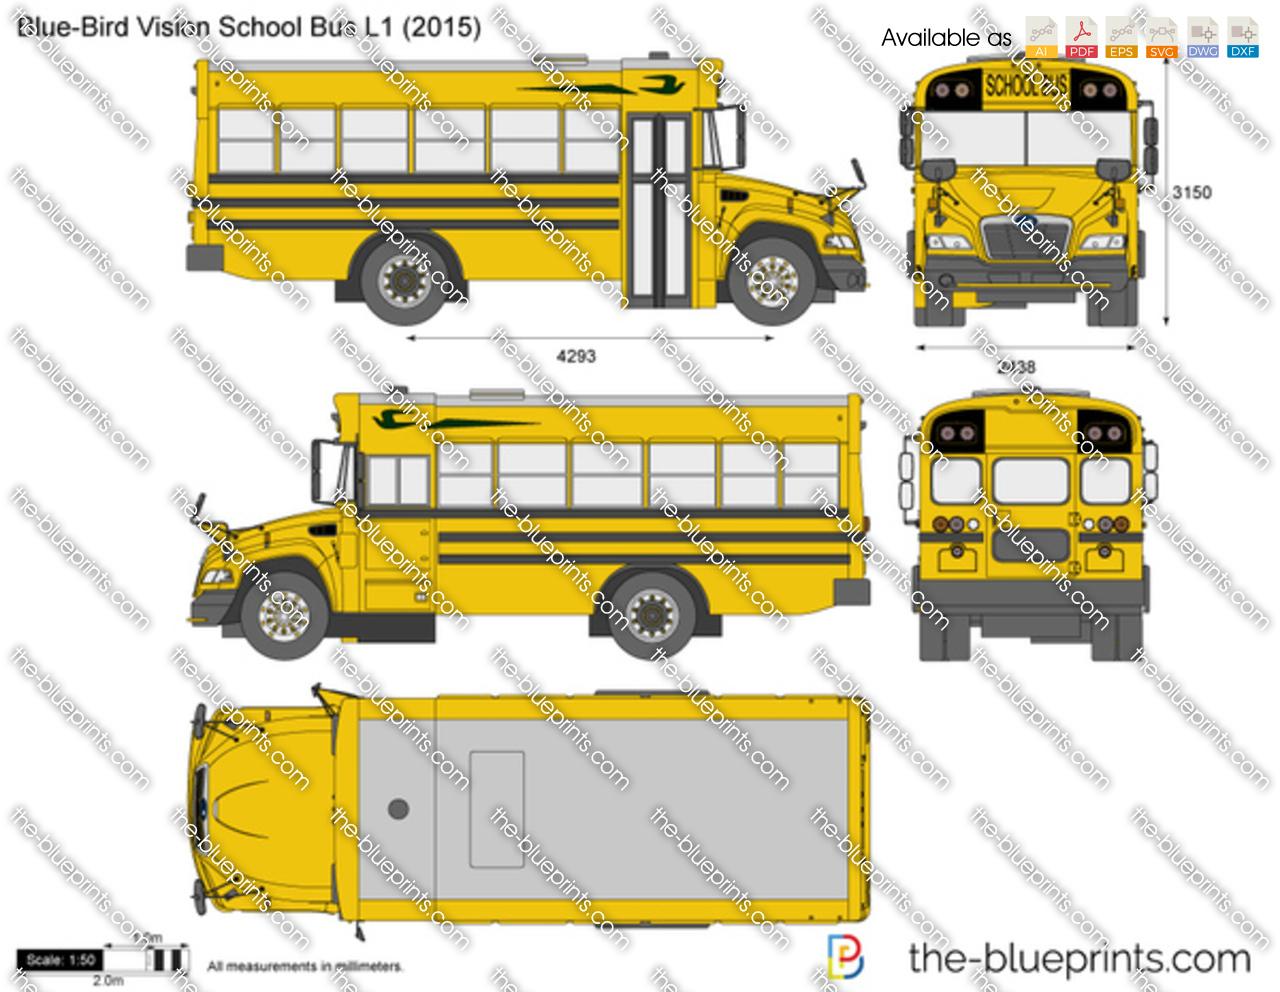 Blue-Bird Vision School Bus L1 2016